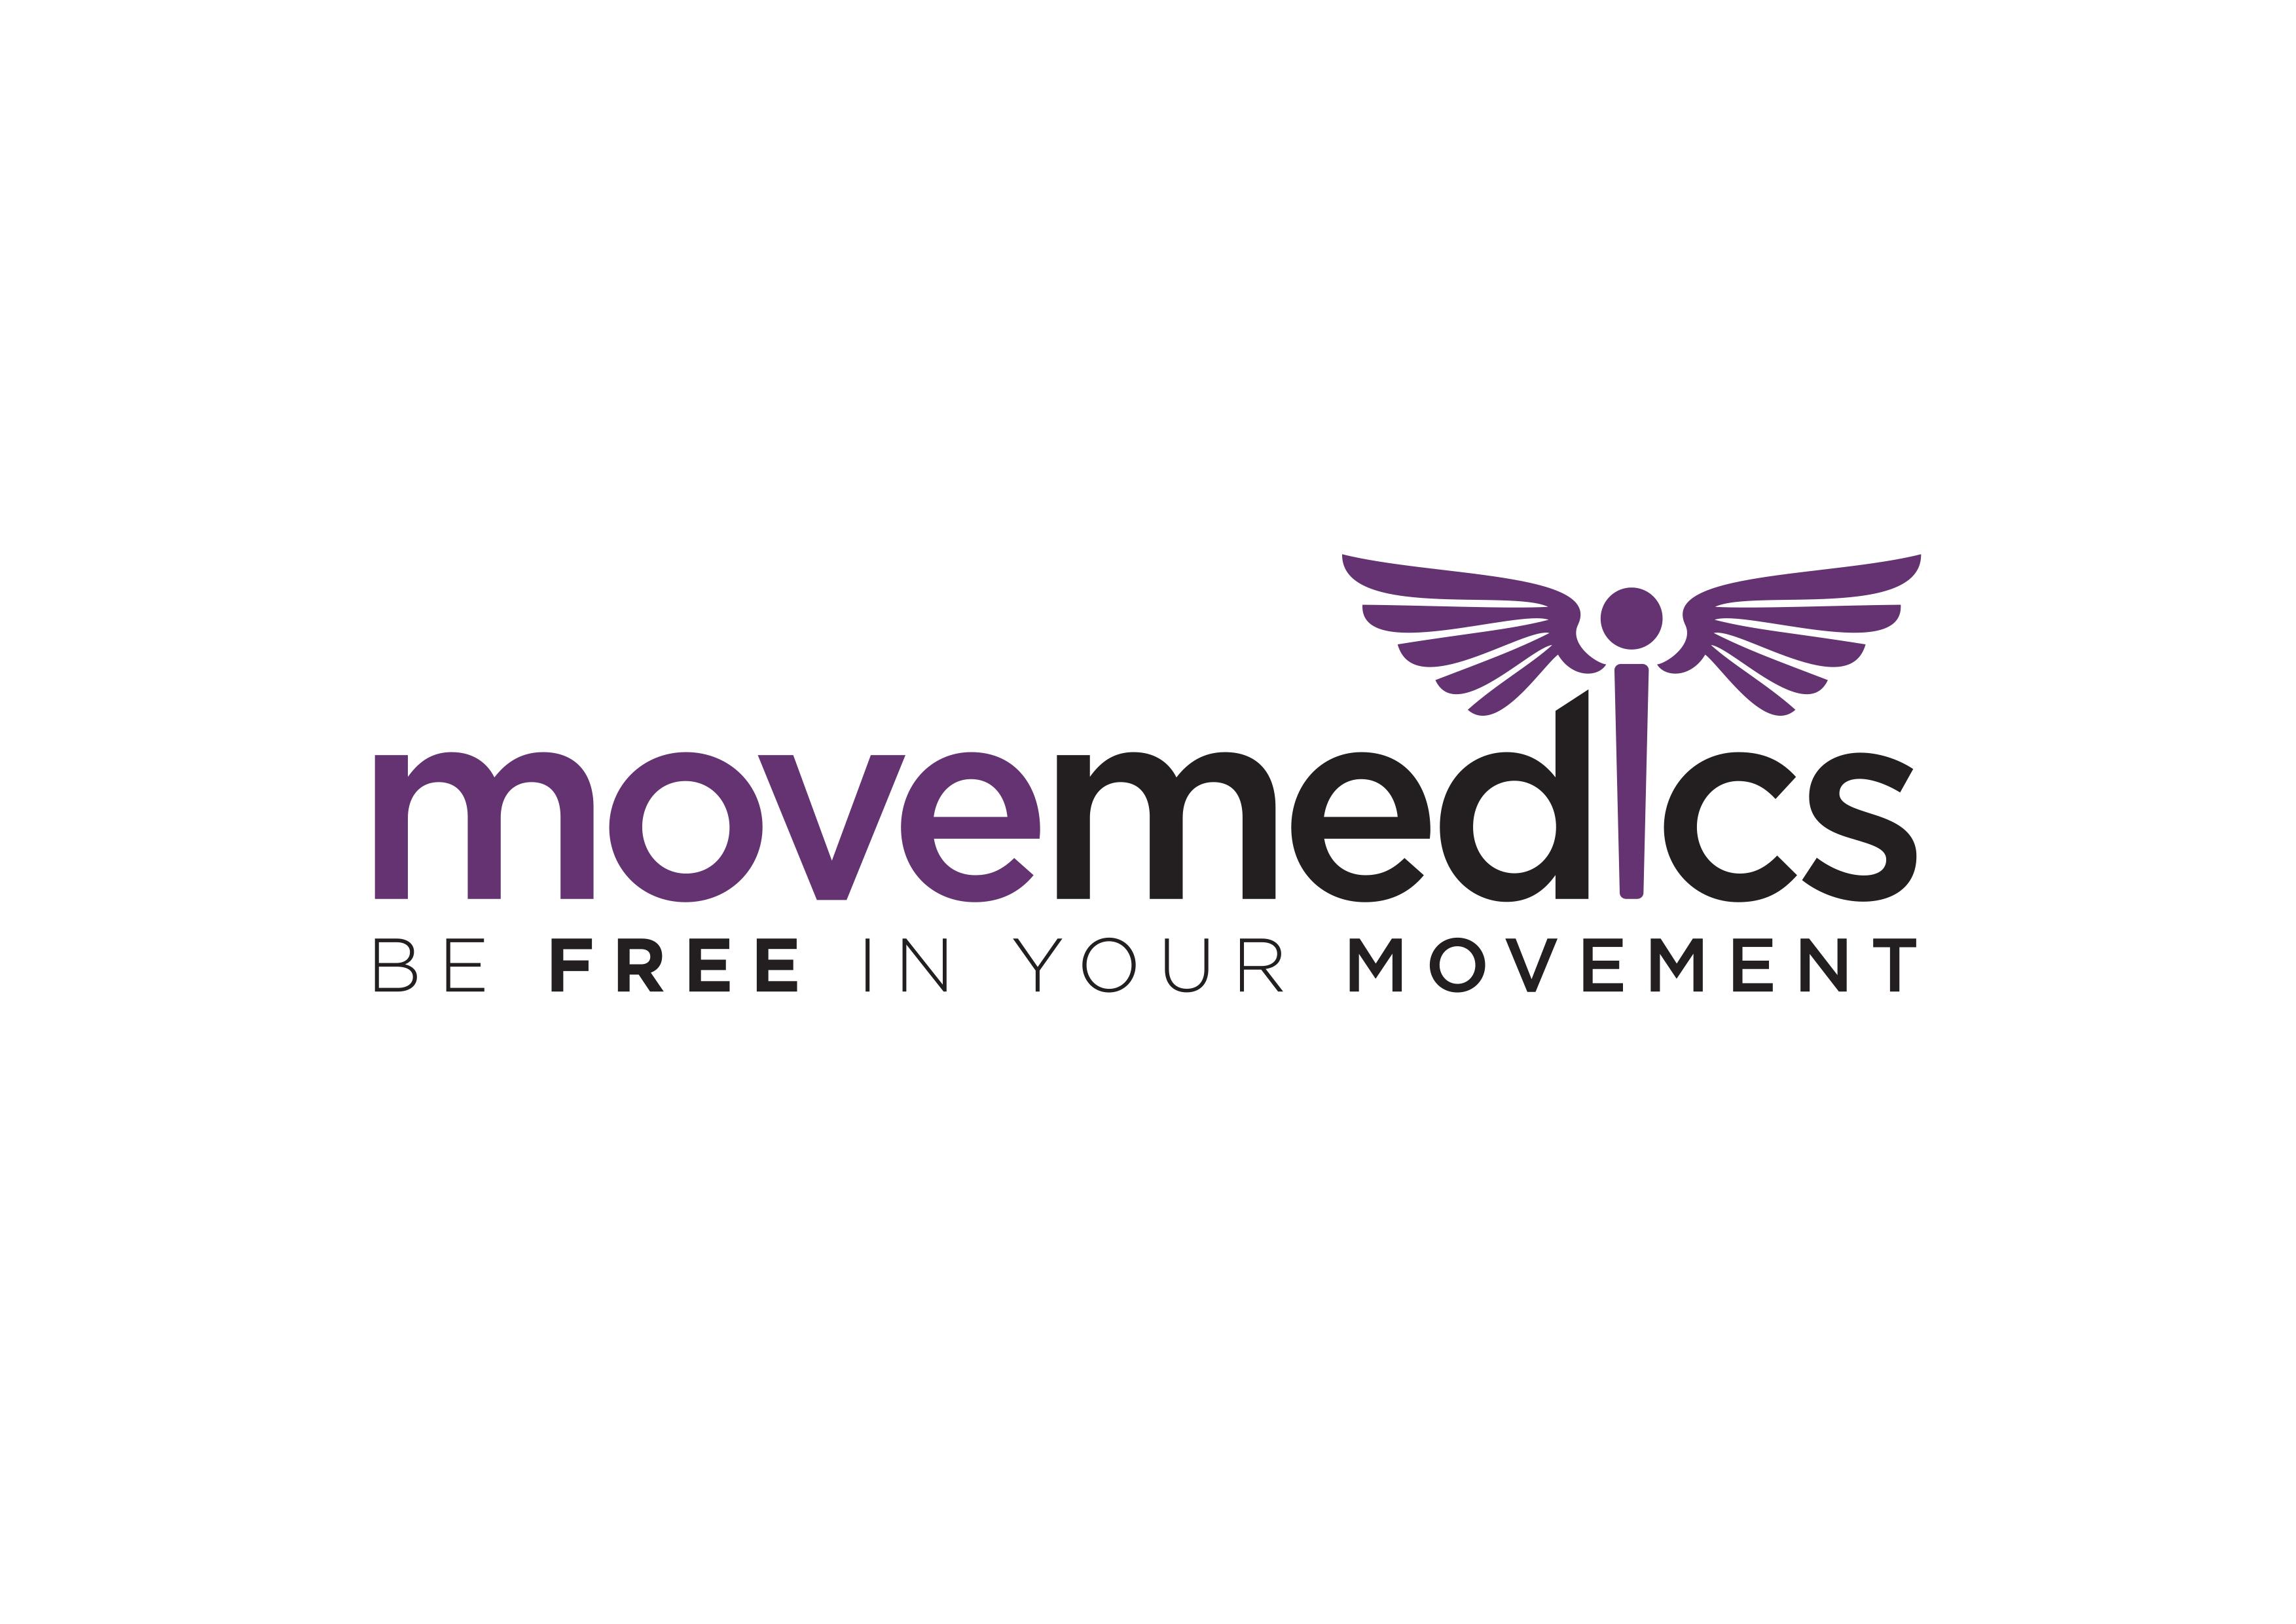 MoveMedics